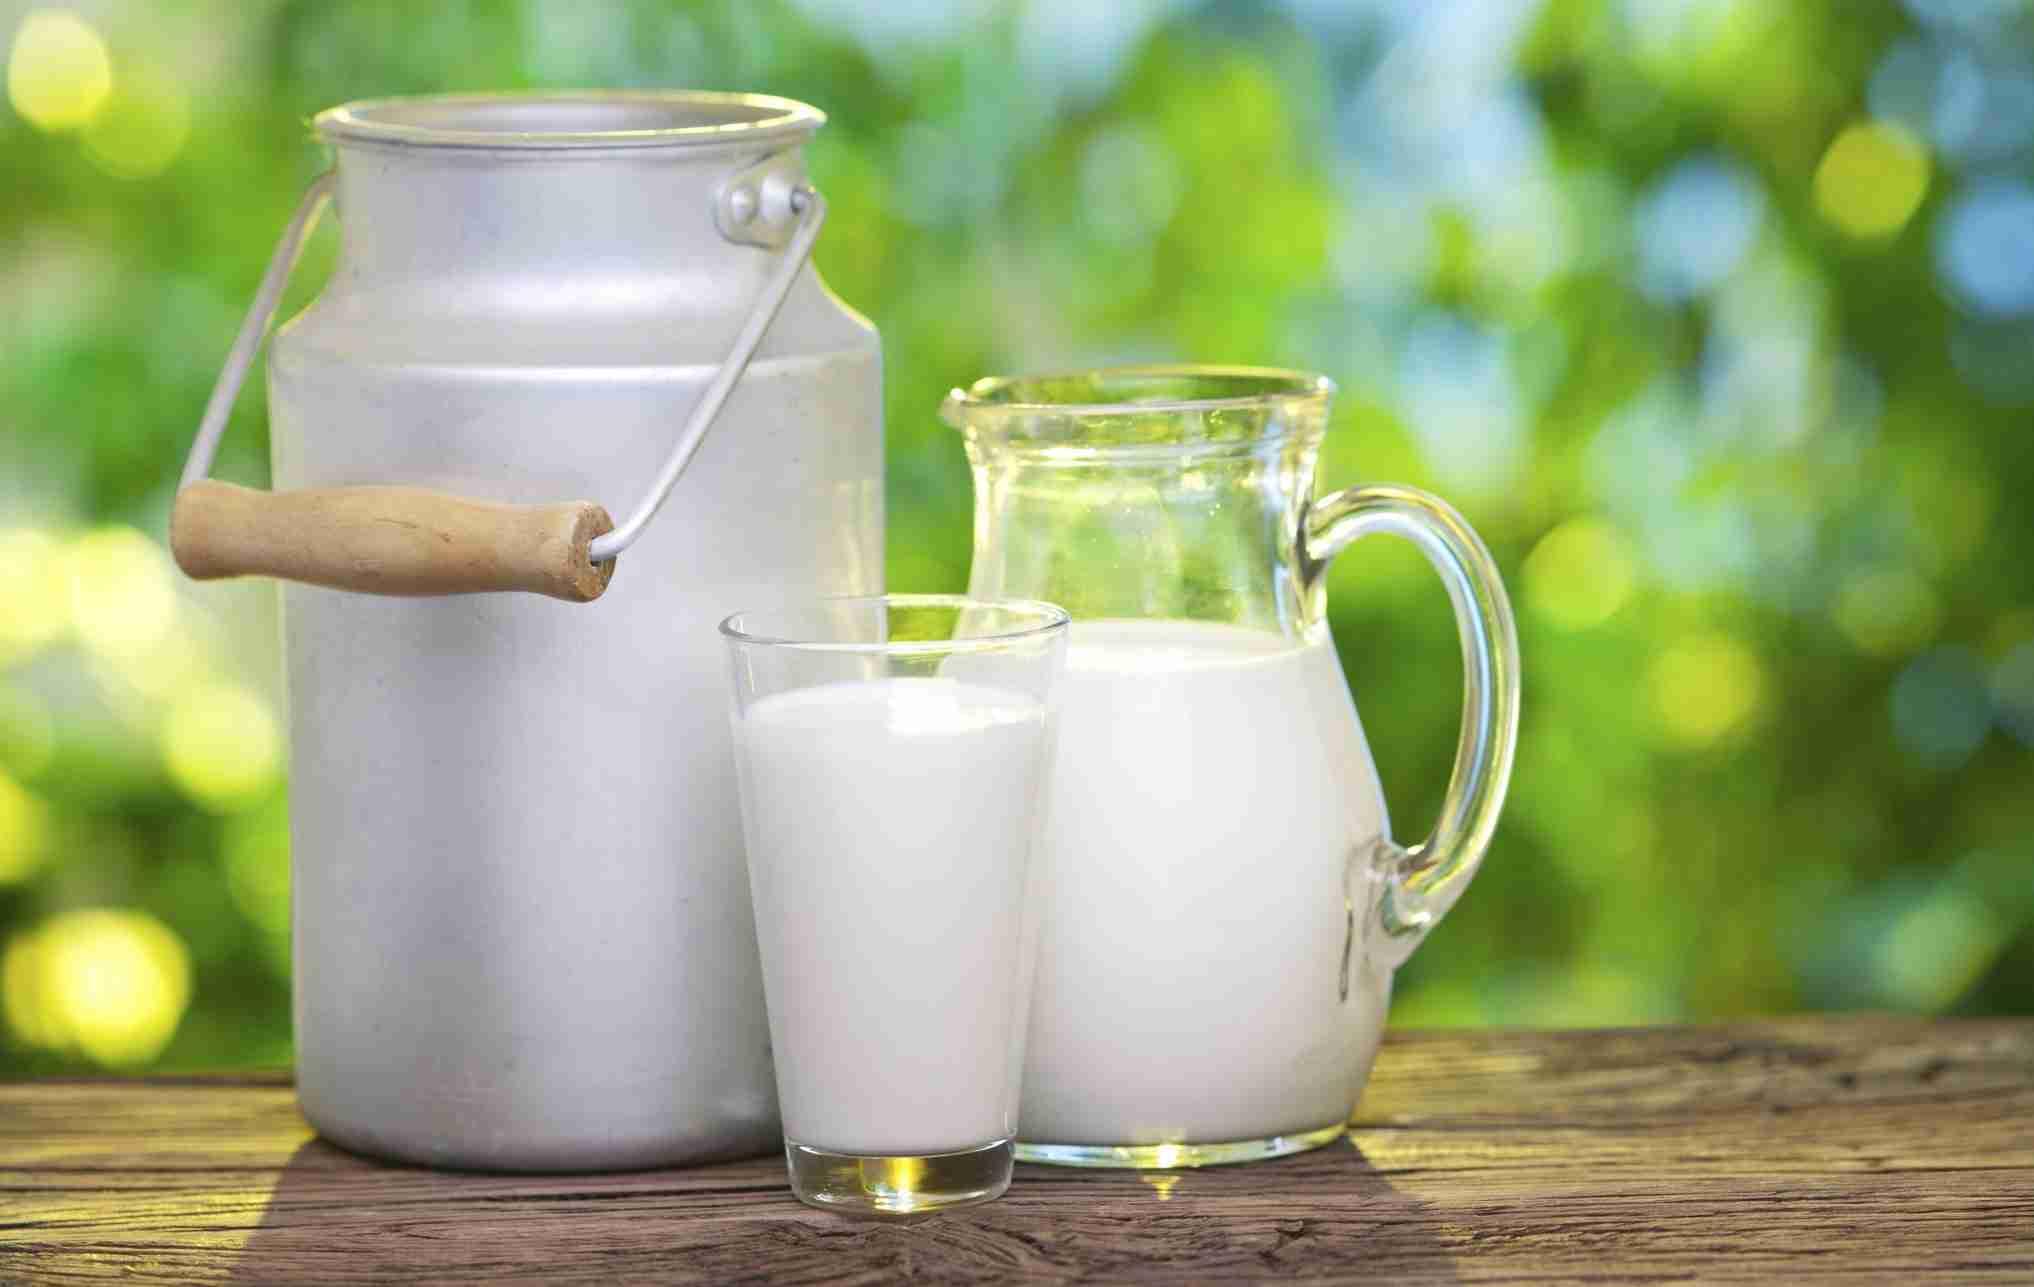 Latte fieno